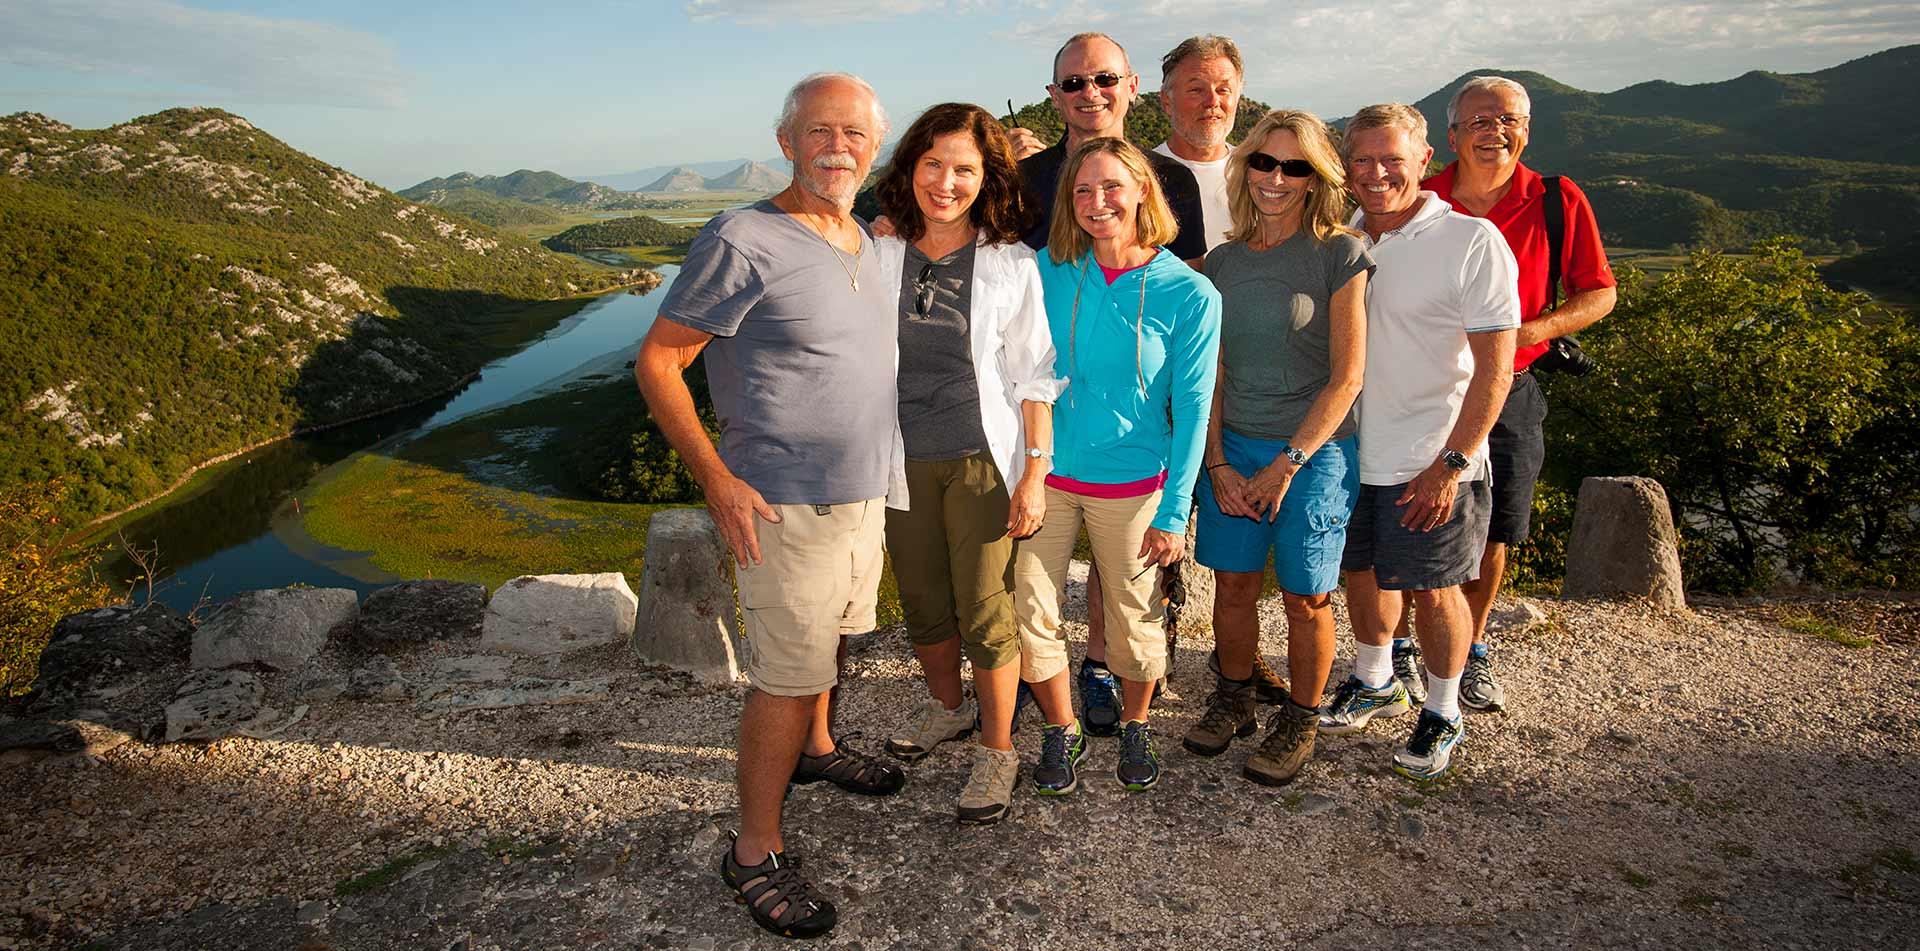 Group of Travelers in Montenegro